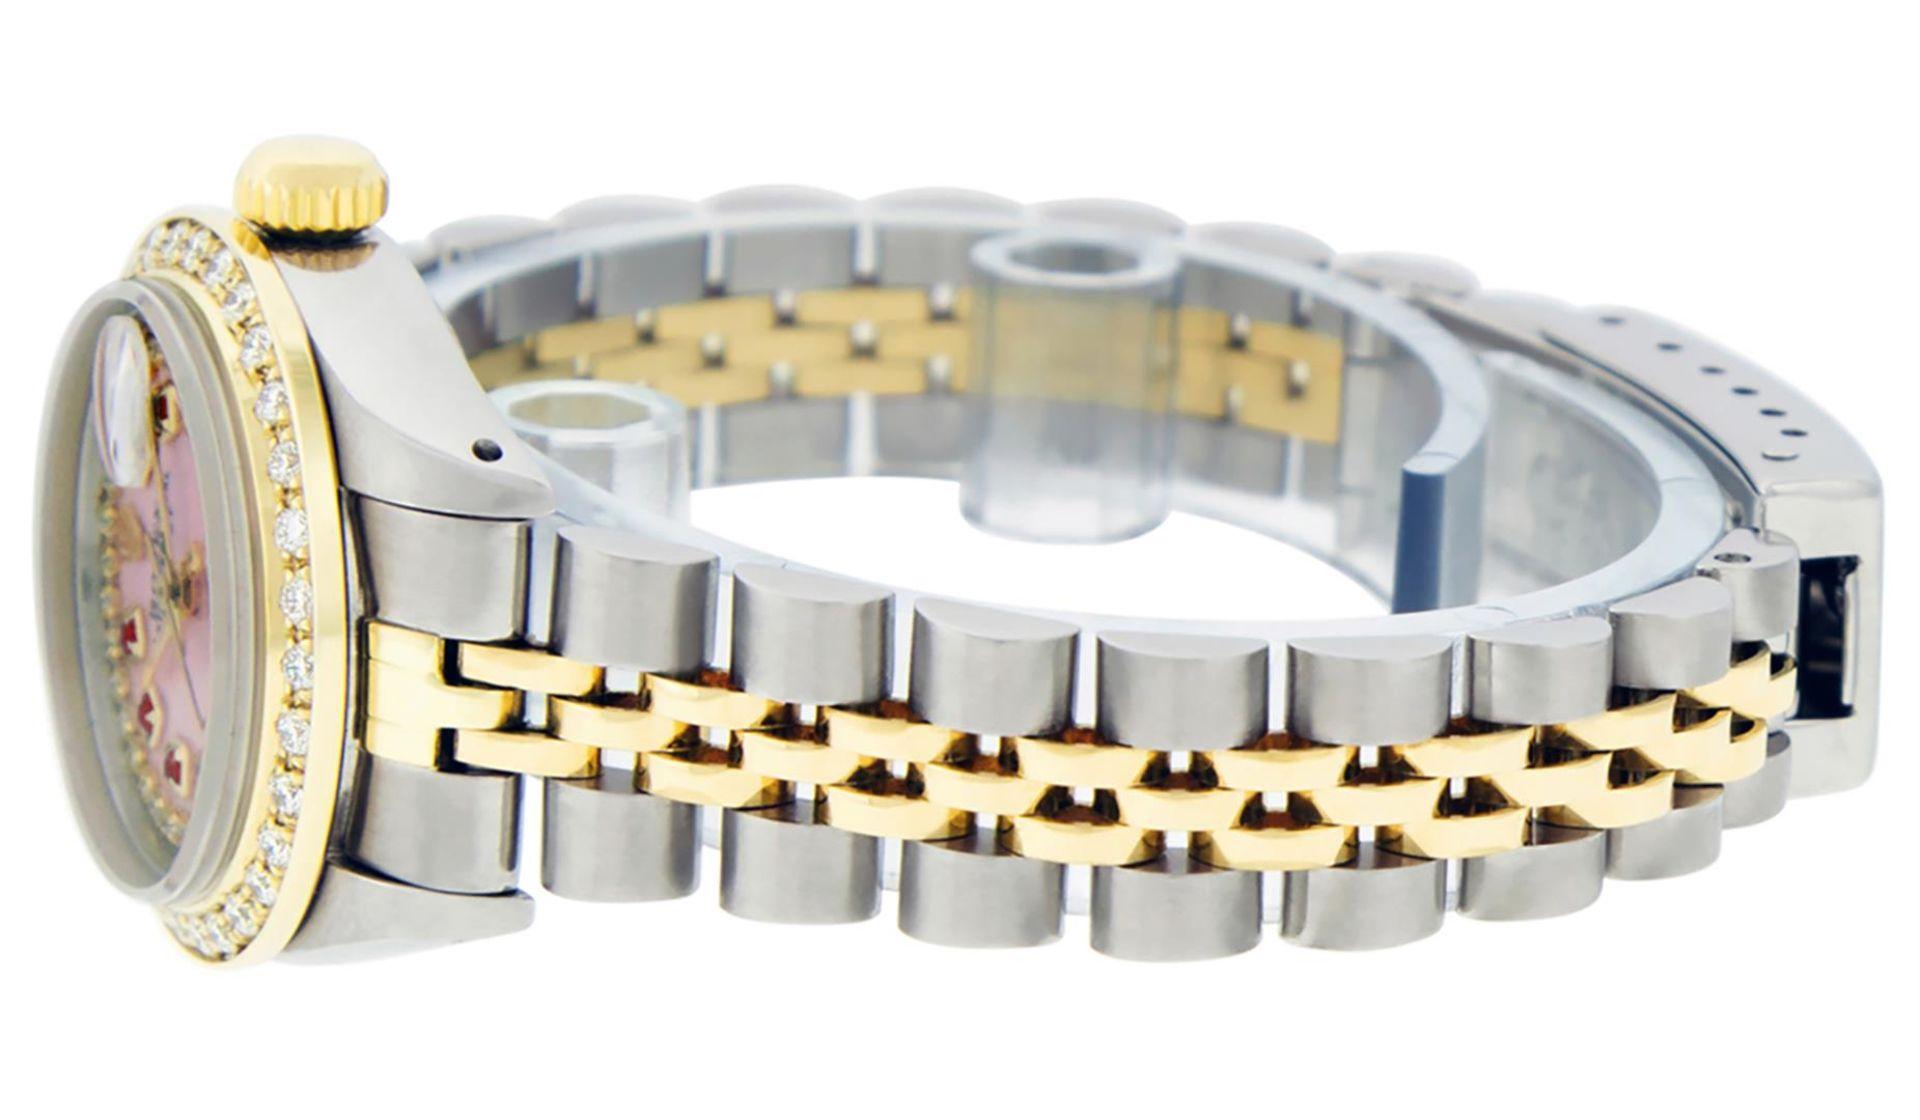 Rolex Ladies 2 Tone Pink MOP Ruby String Diamond Datejust Wristwatch - Image 6 of 9